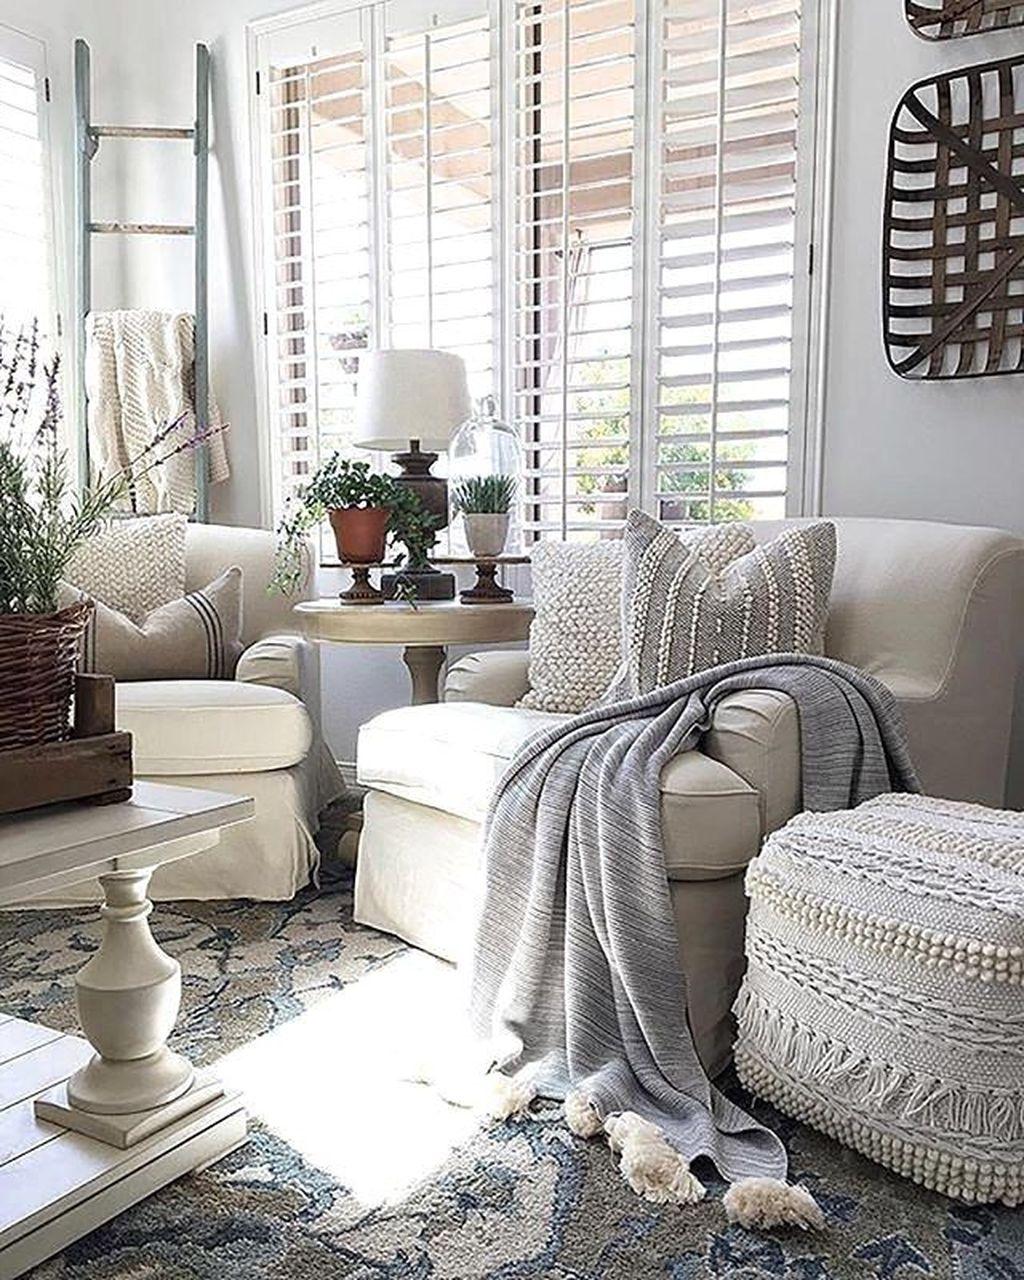 Inspiring Beachy Farmhouse Living Room Decor Ideas 13